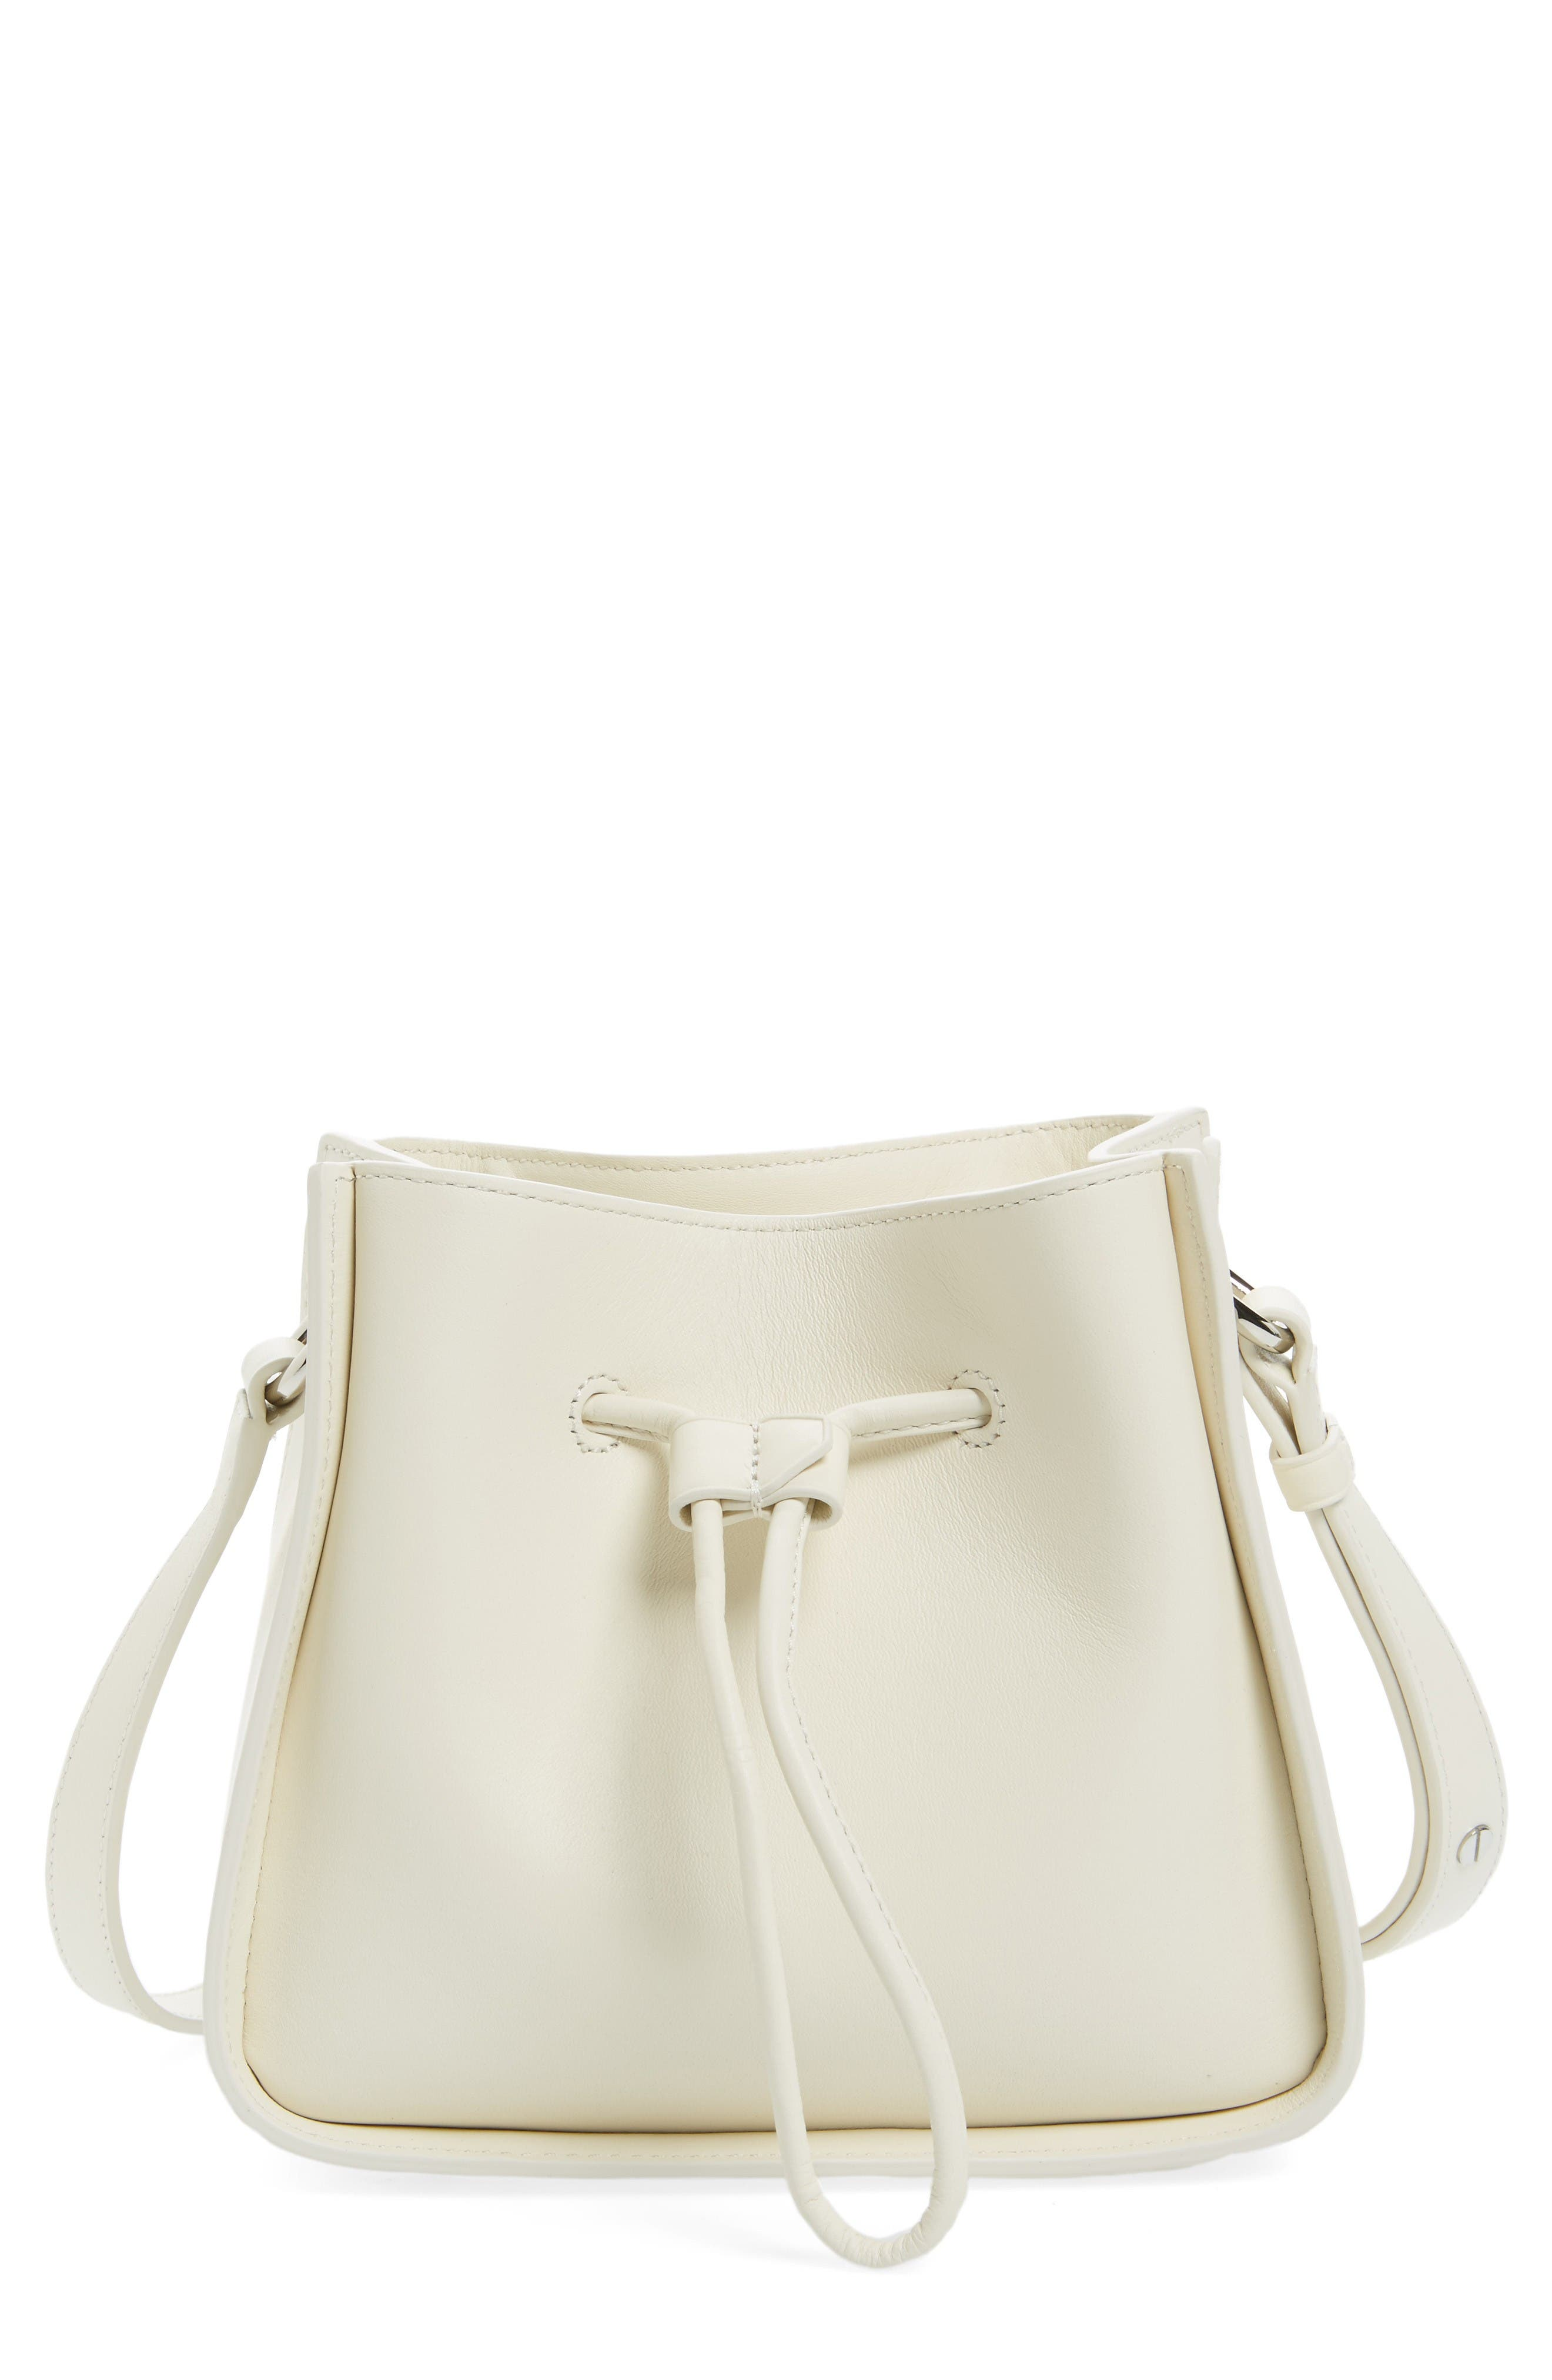 Main Image - 3.1 Phillip Lim Mini Soleil Leather Bucket Bag